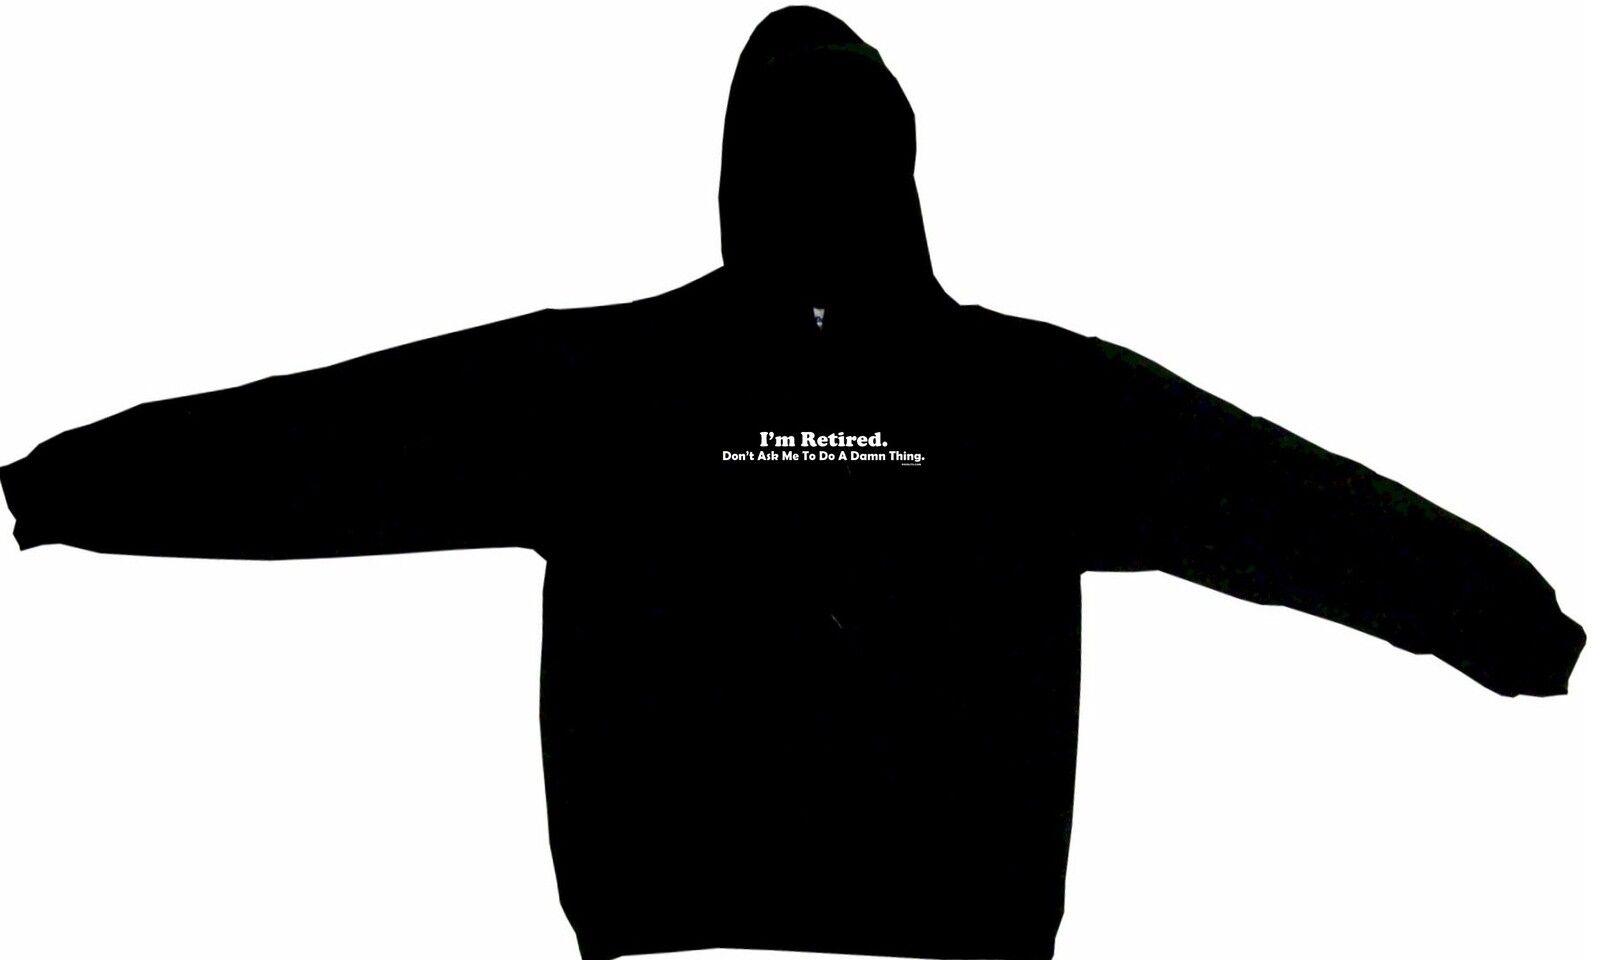 I'm RetiROT Don't Ask Me To Do a Damn Thing Hoodie Sweatshirt